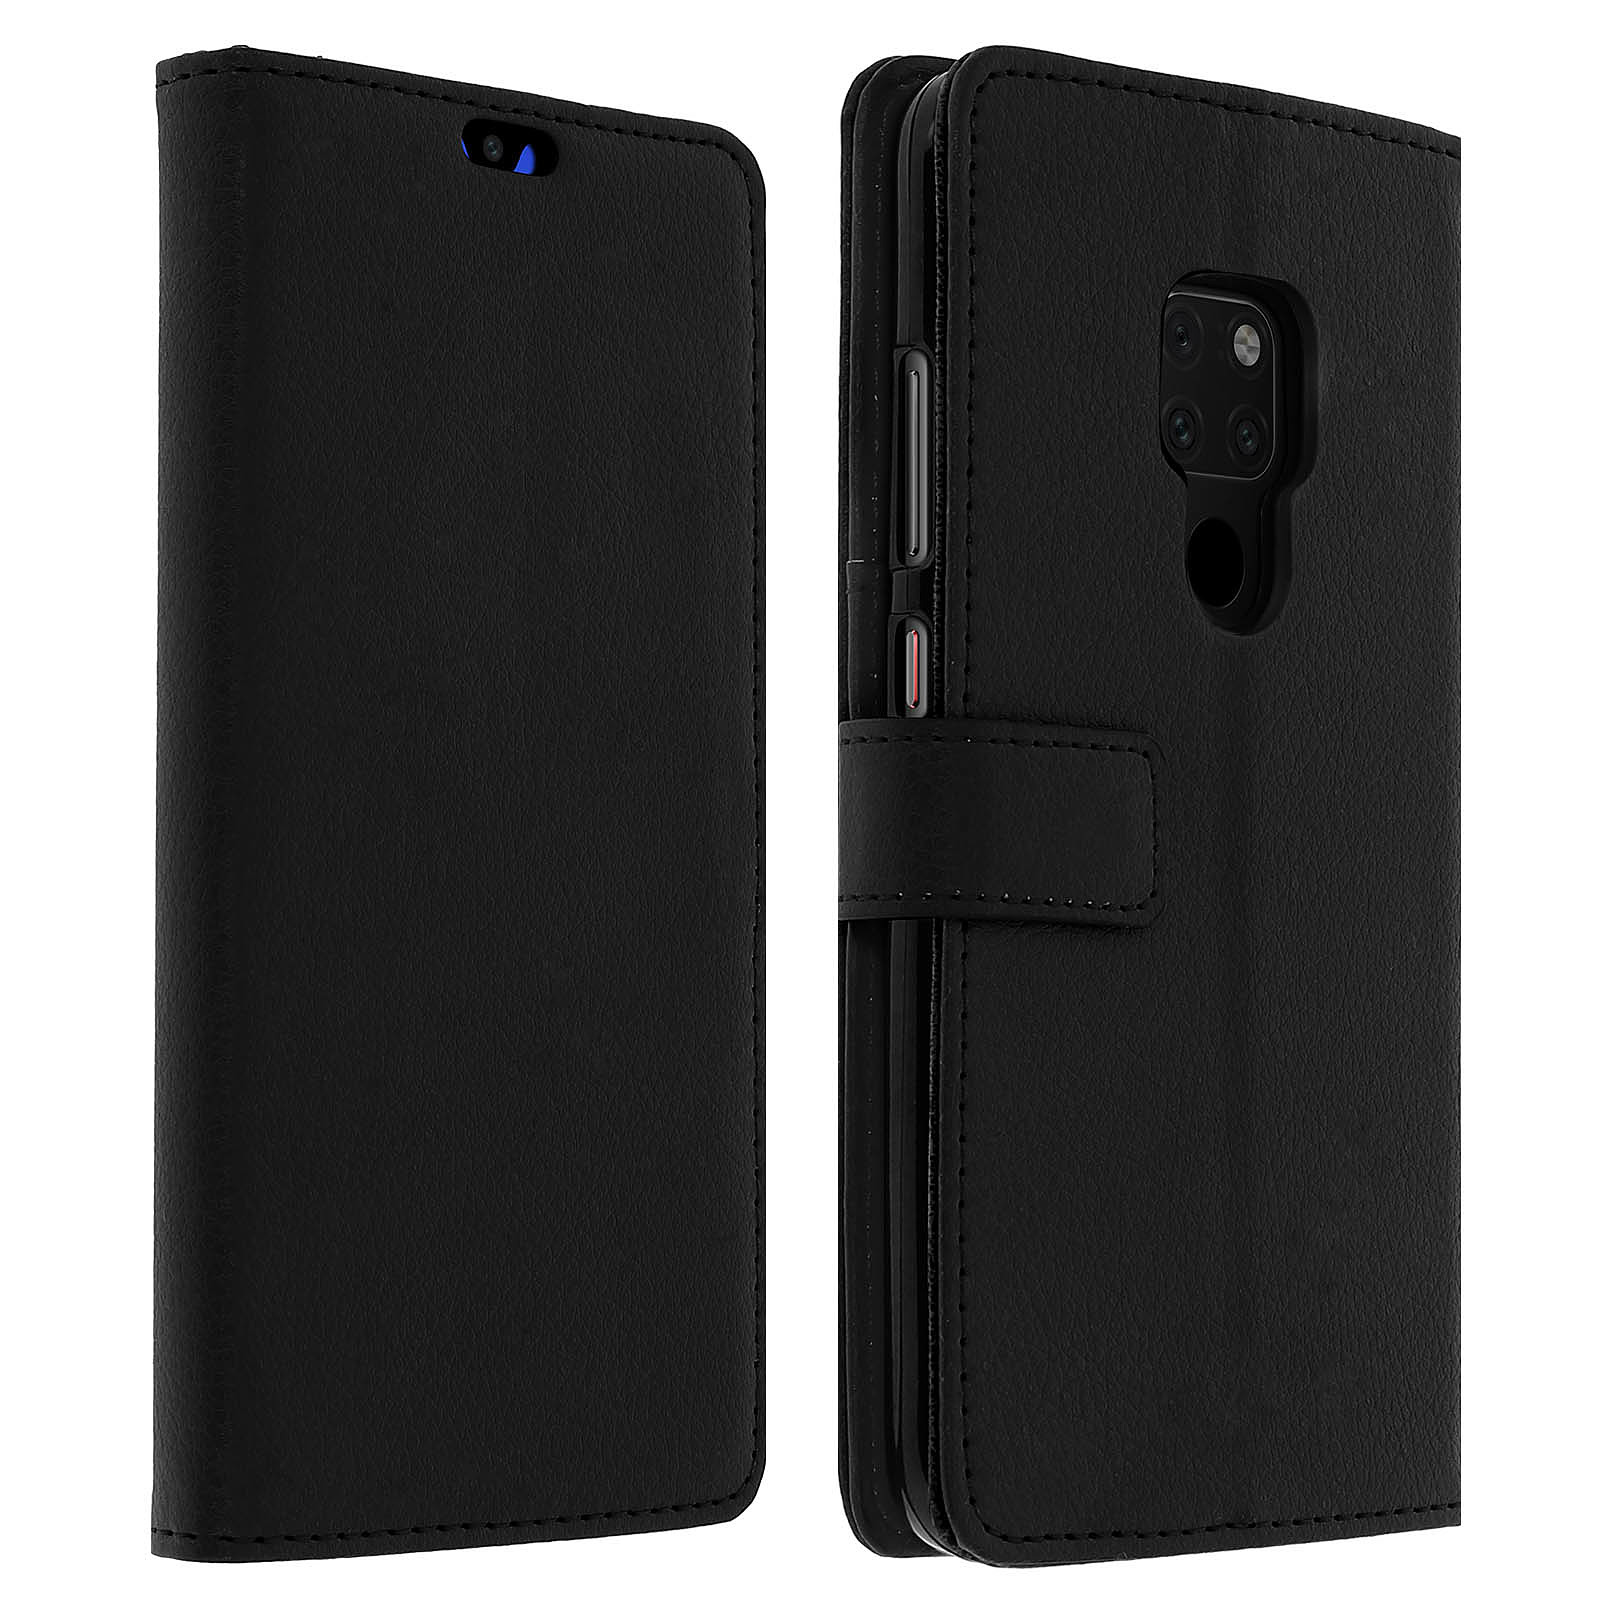 Avizar Etui folio Noir Rangement Carte pour Huawei Mate 20